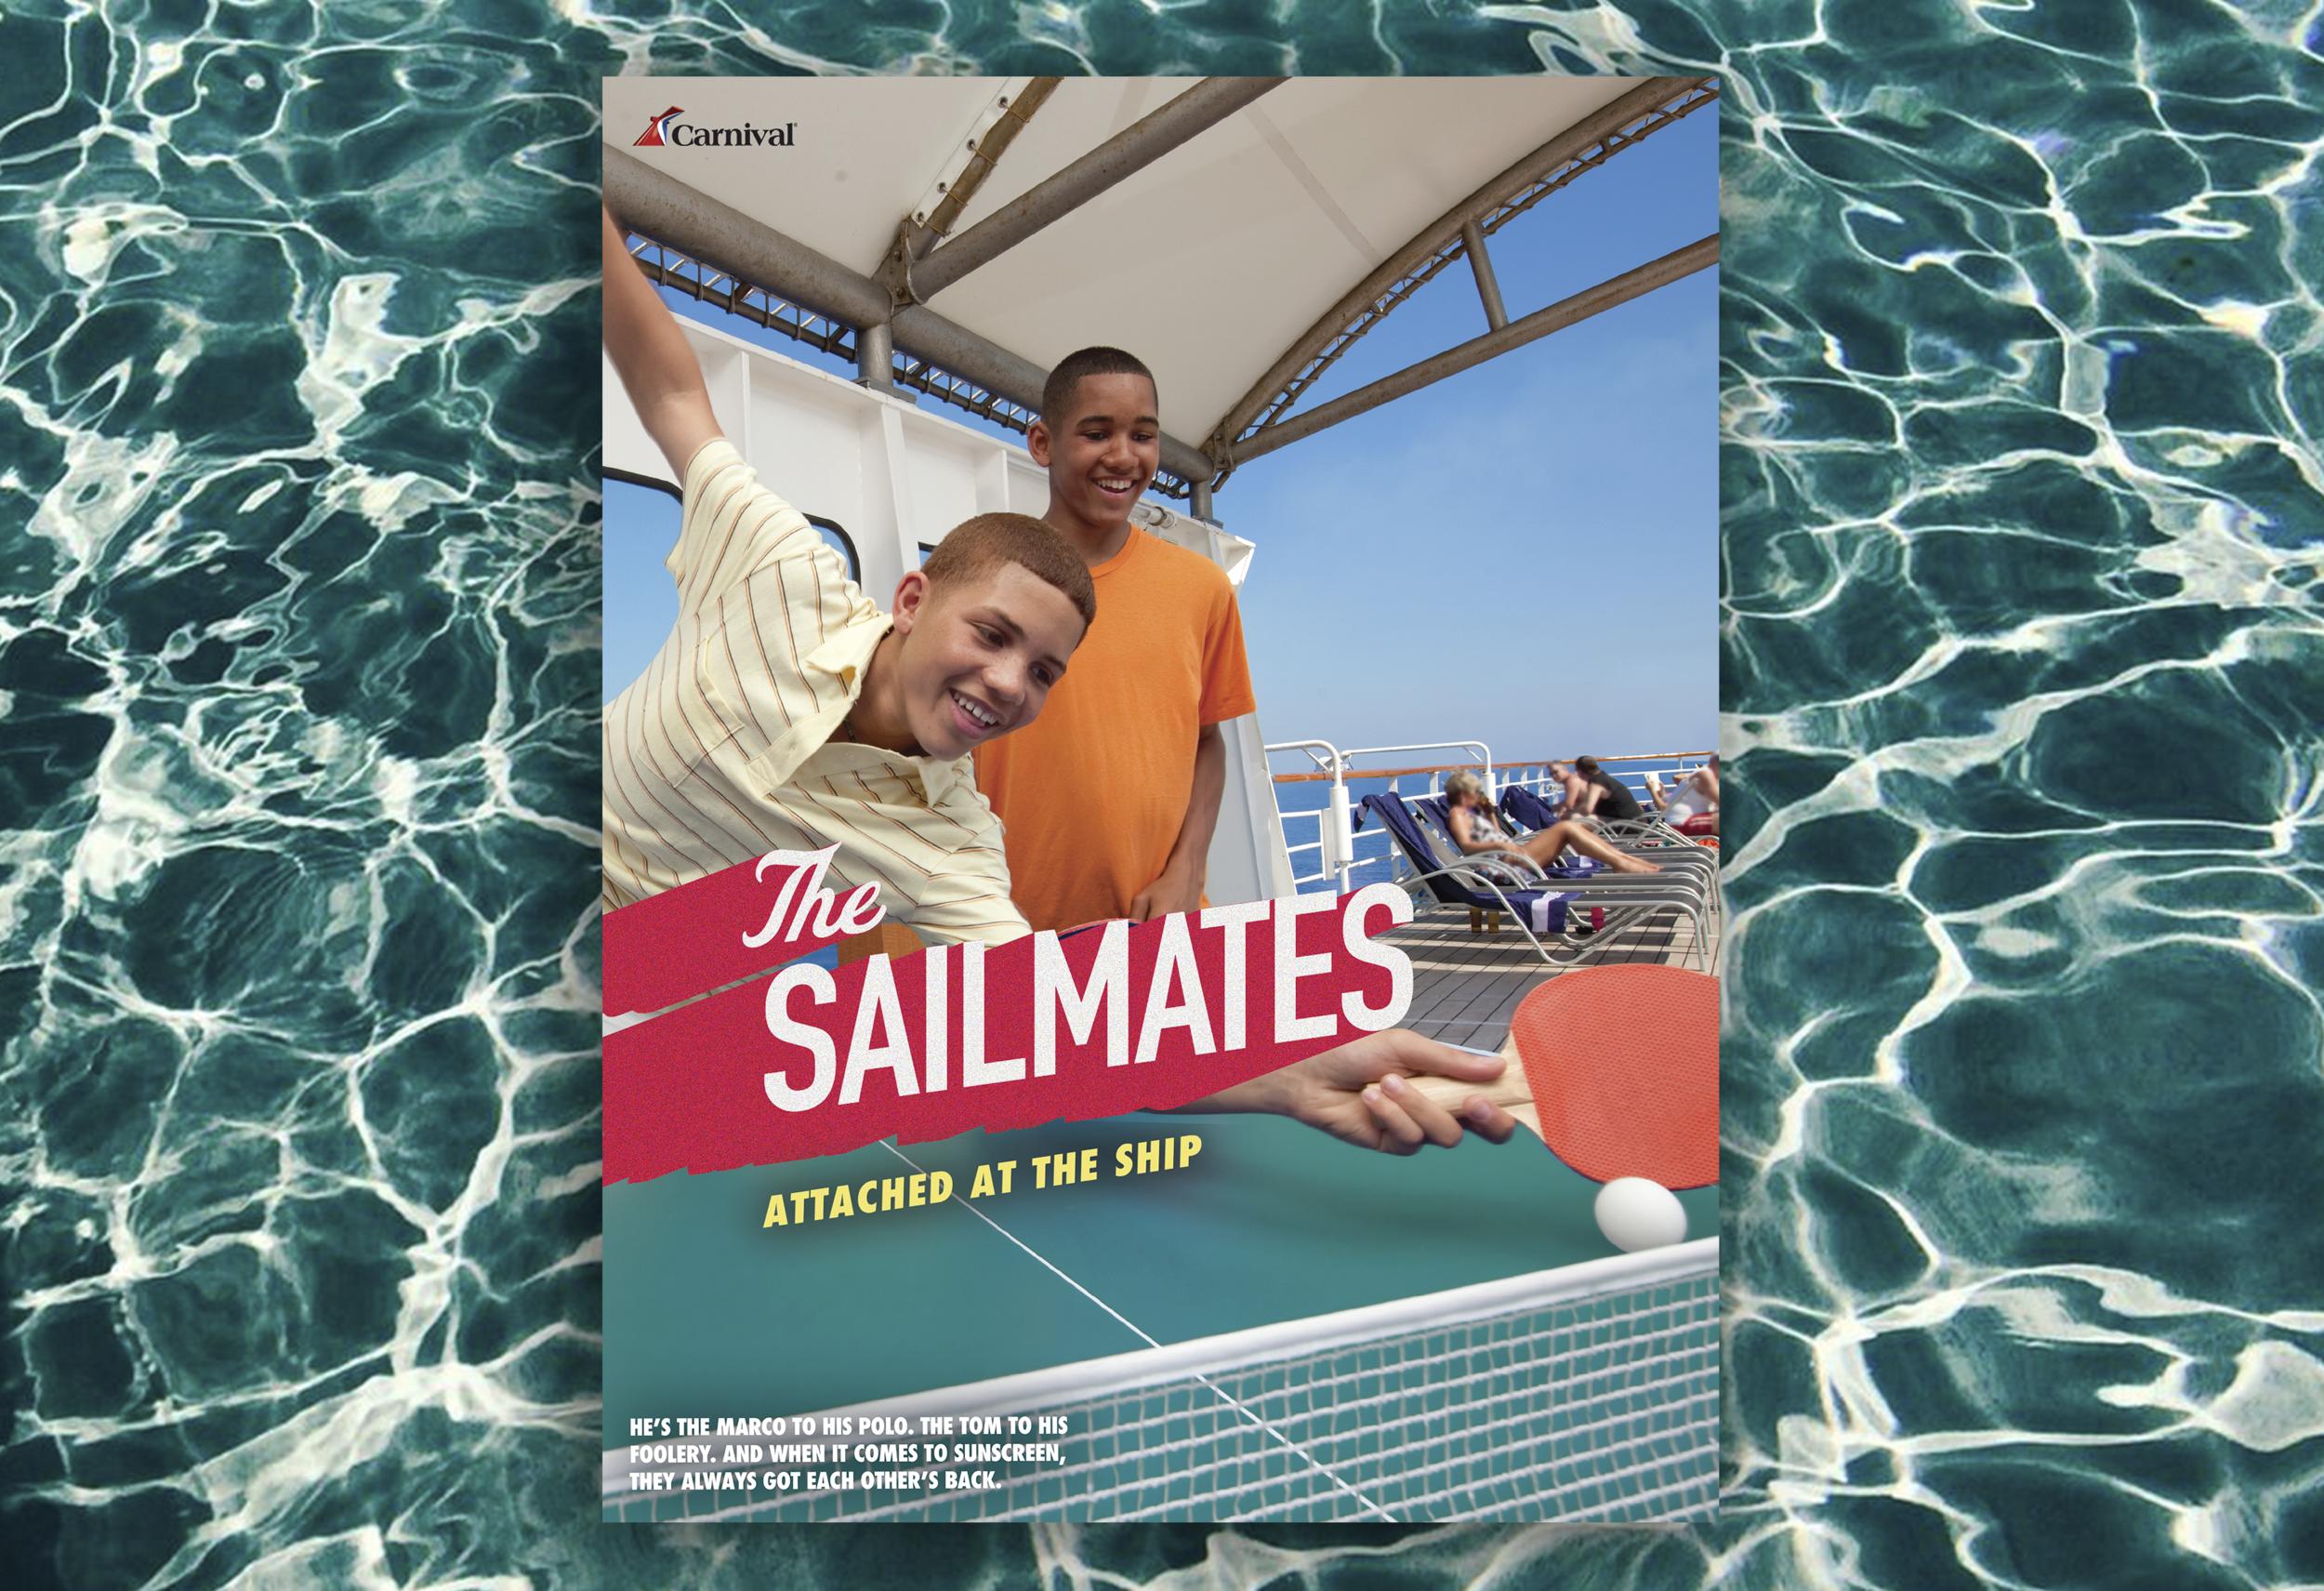 sailmates_mockup.png